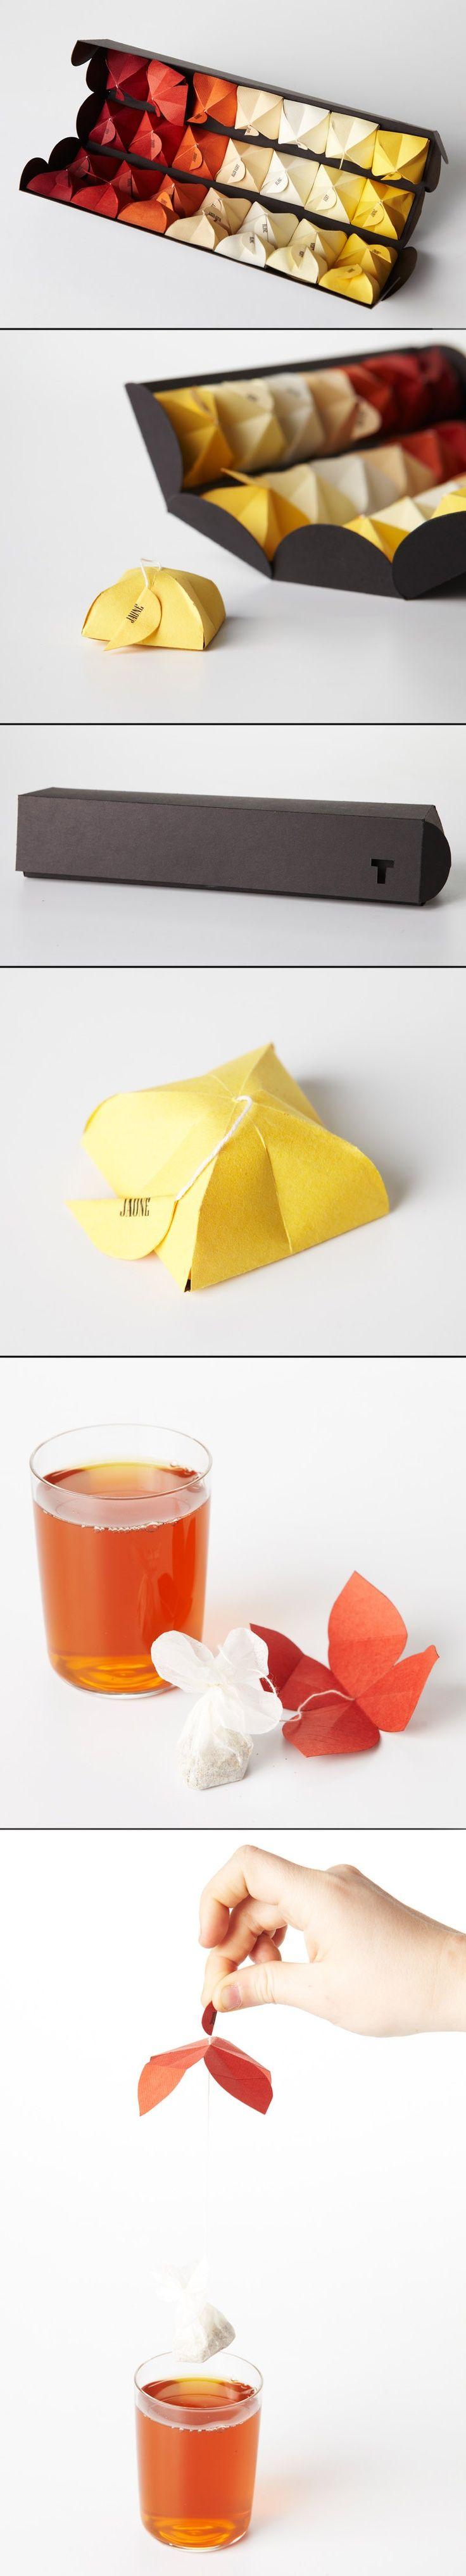 tea packaging by Maria Milagros Rodriguez Bouroncle: tea packaging by Maria Milagros Rodriguez Bouroncle